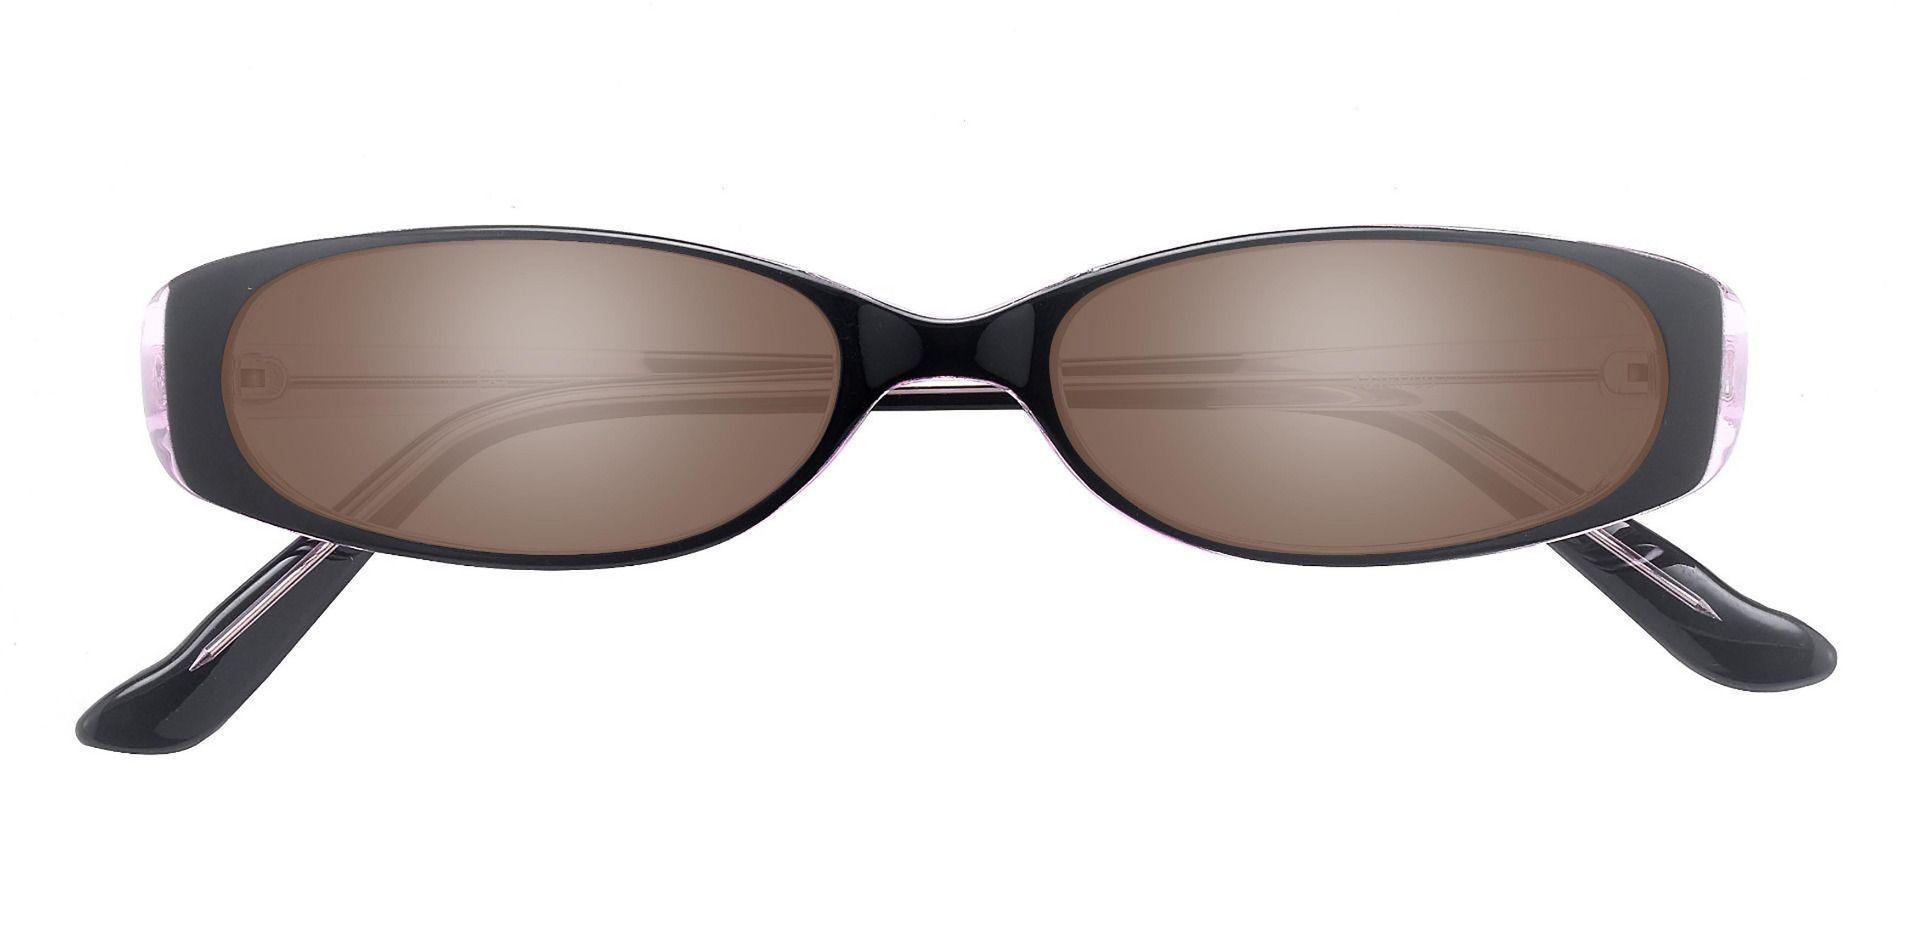 Venetia Oval Single Vision Sunglasses - Purple Frame With Brown Lenses